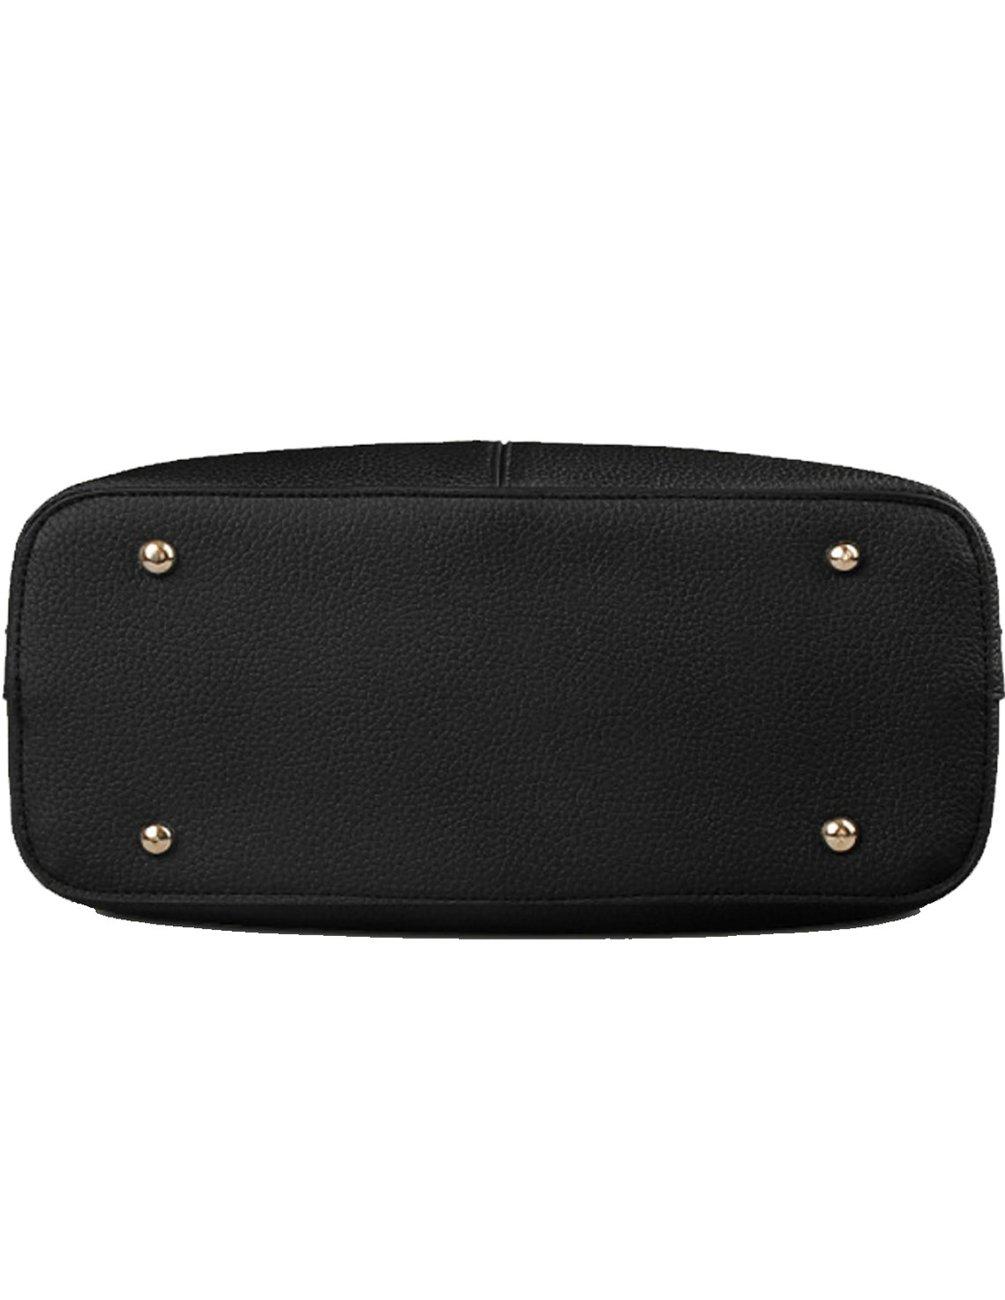 BE-LIFE-Stylish-Women-Pu-Leather-Vertical-Utility-Top-Handle-Handbag-Satchel-Tote-Purse-Bag